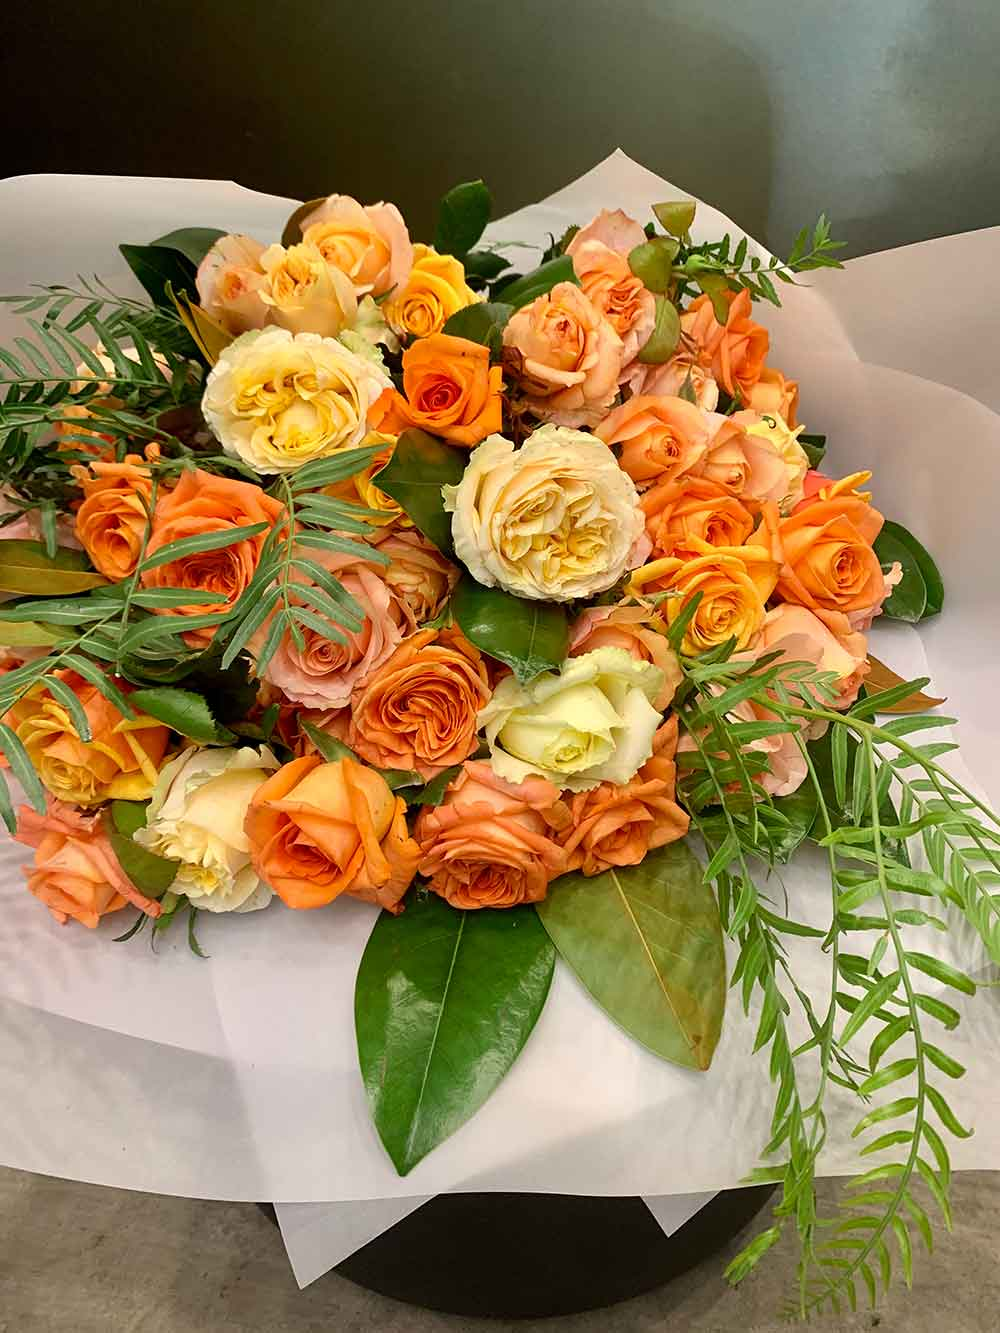 Autumn Beauty - Local Garden Roses